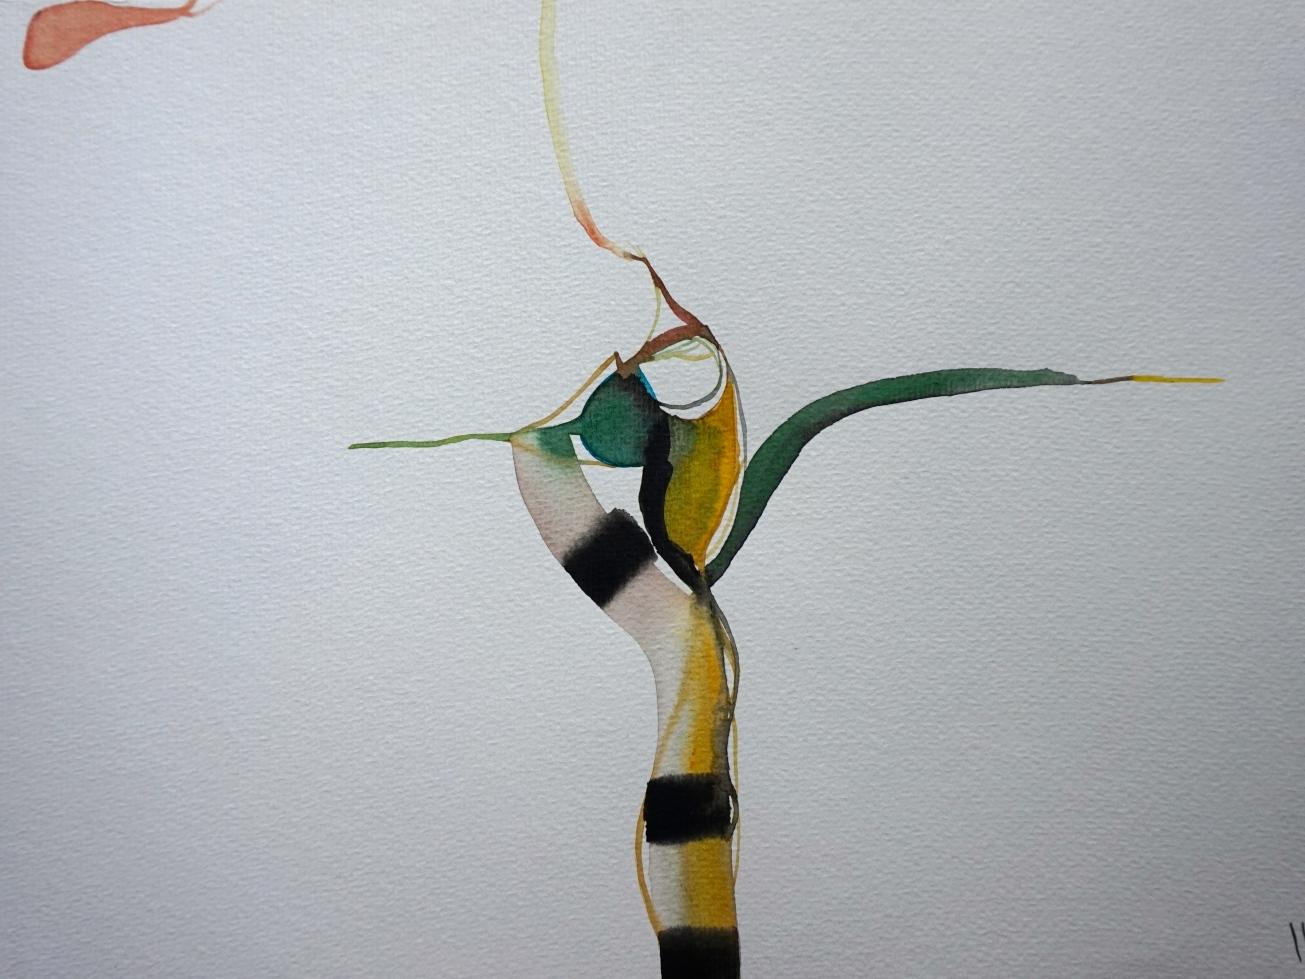 Verde 3, watercolours, 30 x 40 cm, Laura Barbuto, 2013.